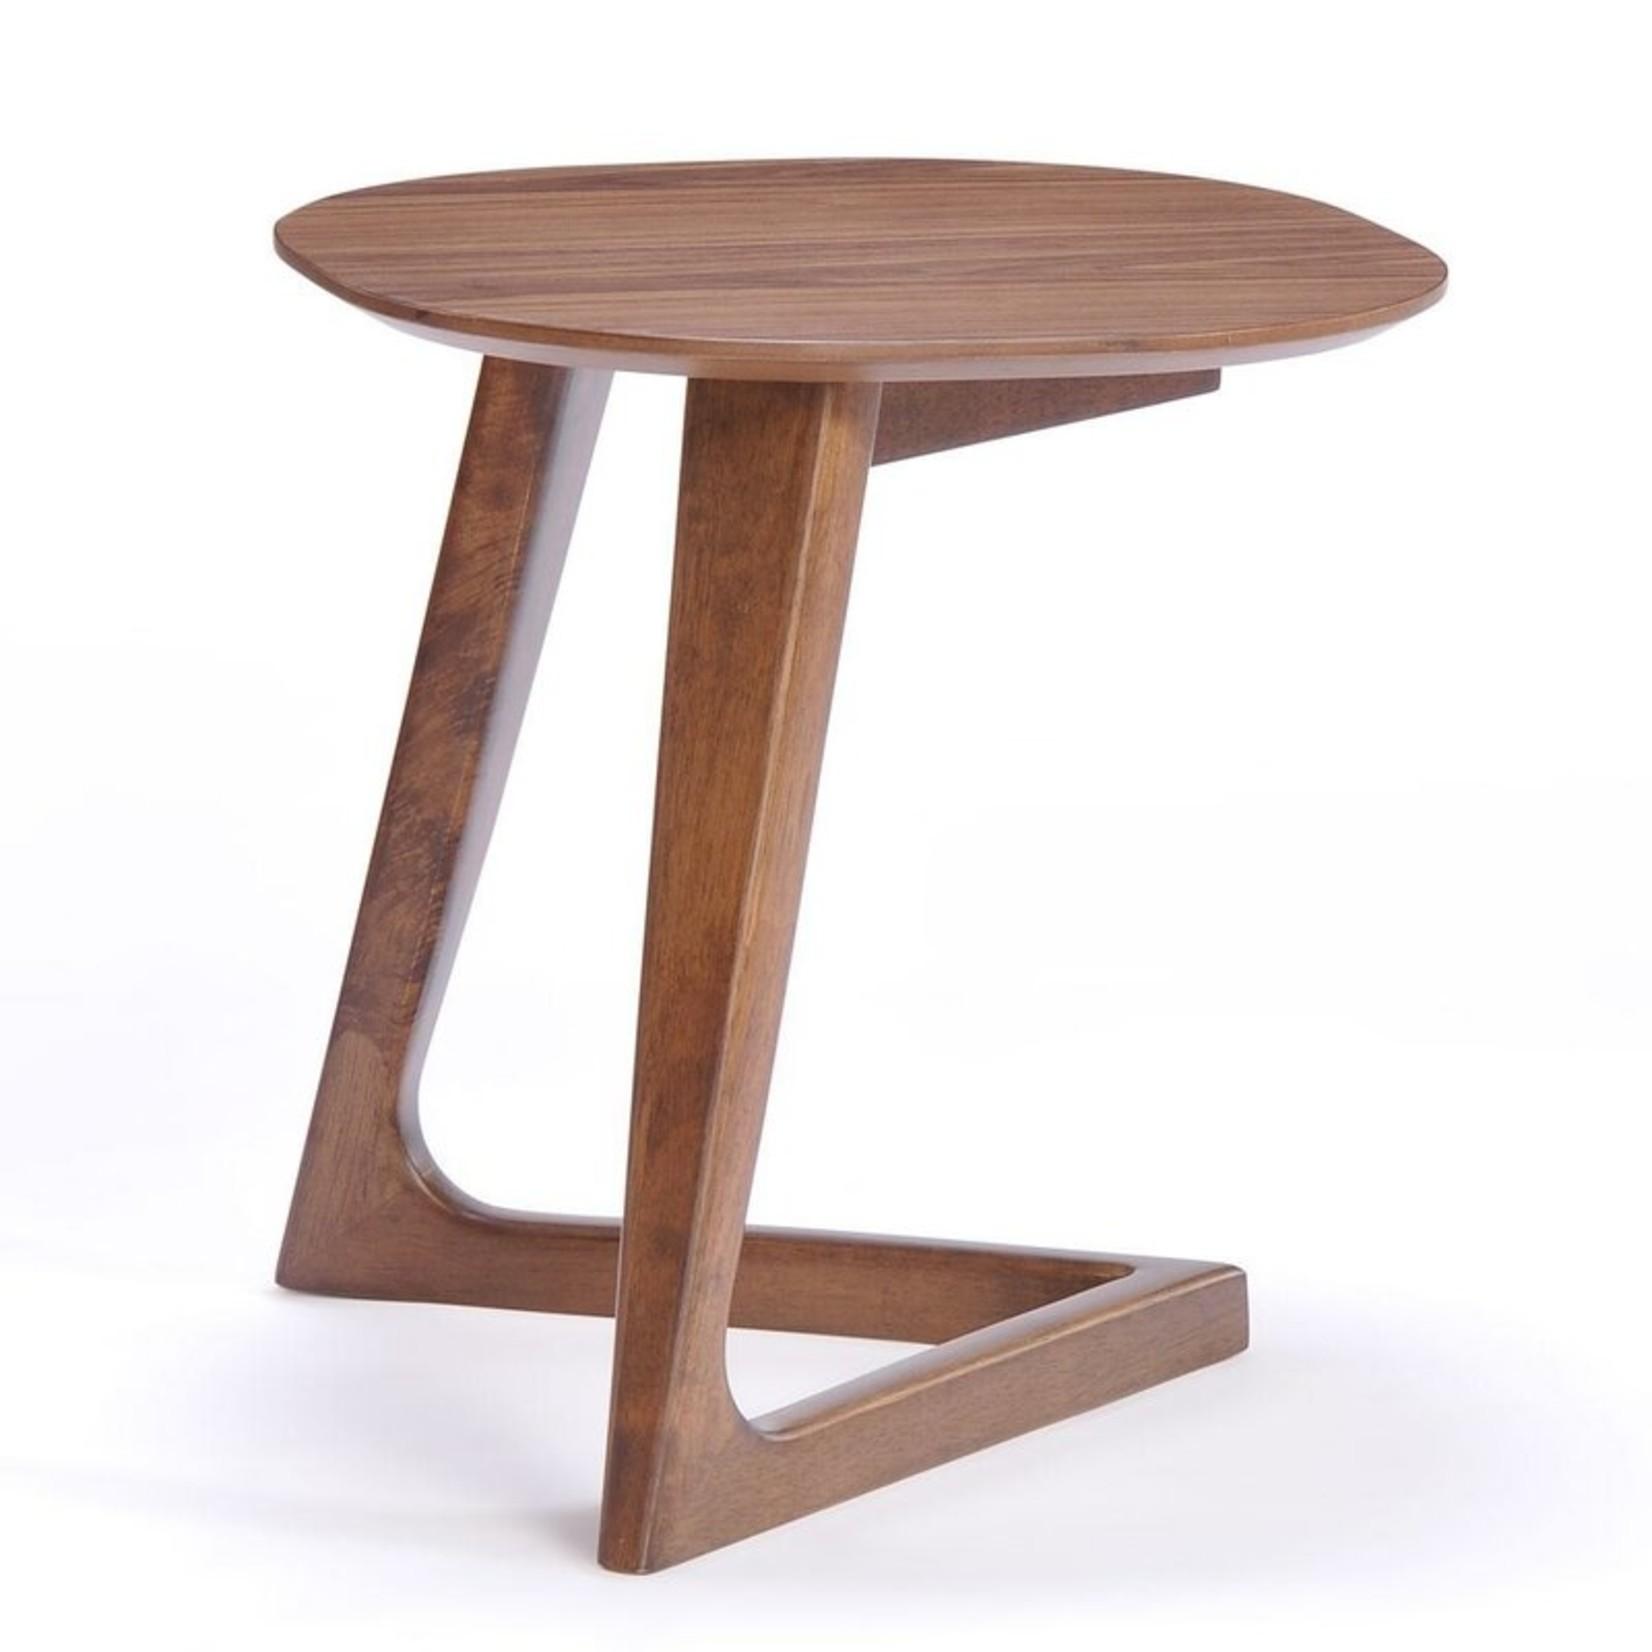 *Mullaney C End Tables - Set of 2